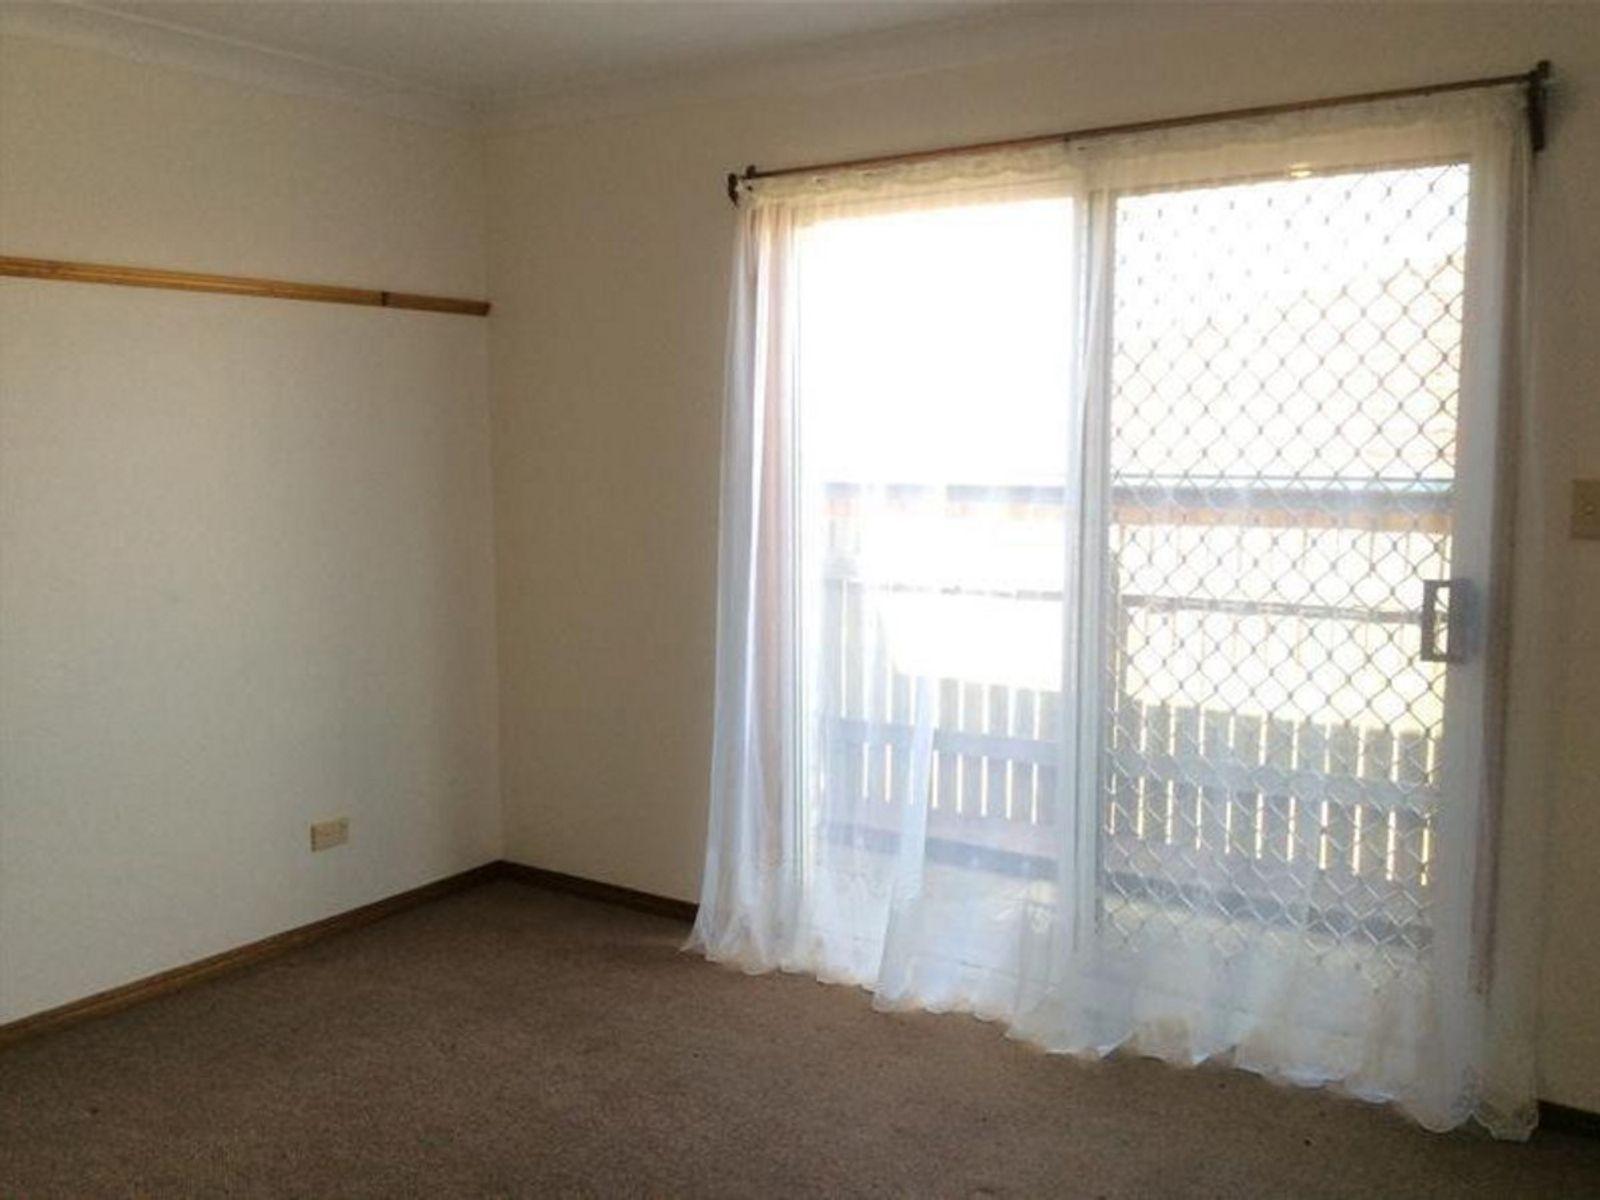 2/382 West Street, Kearneys Spring, QLD 4350